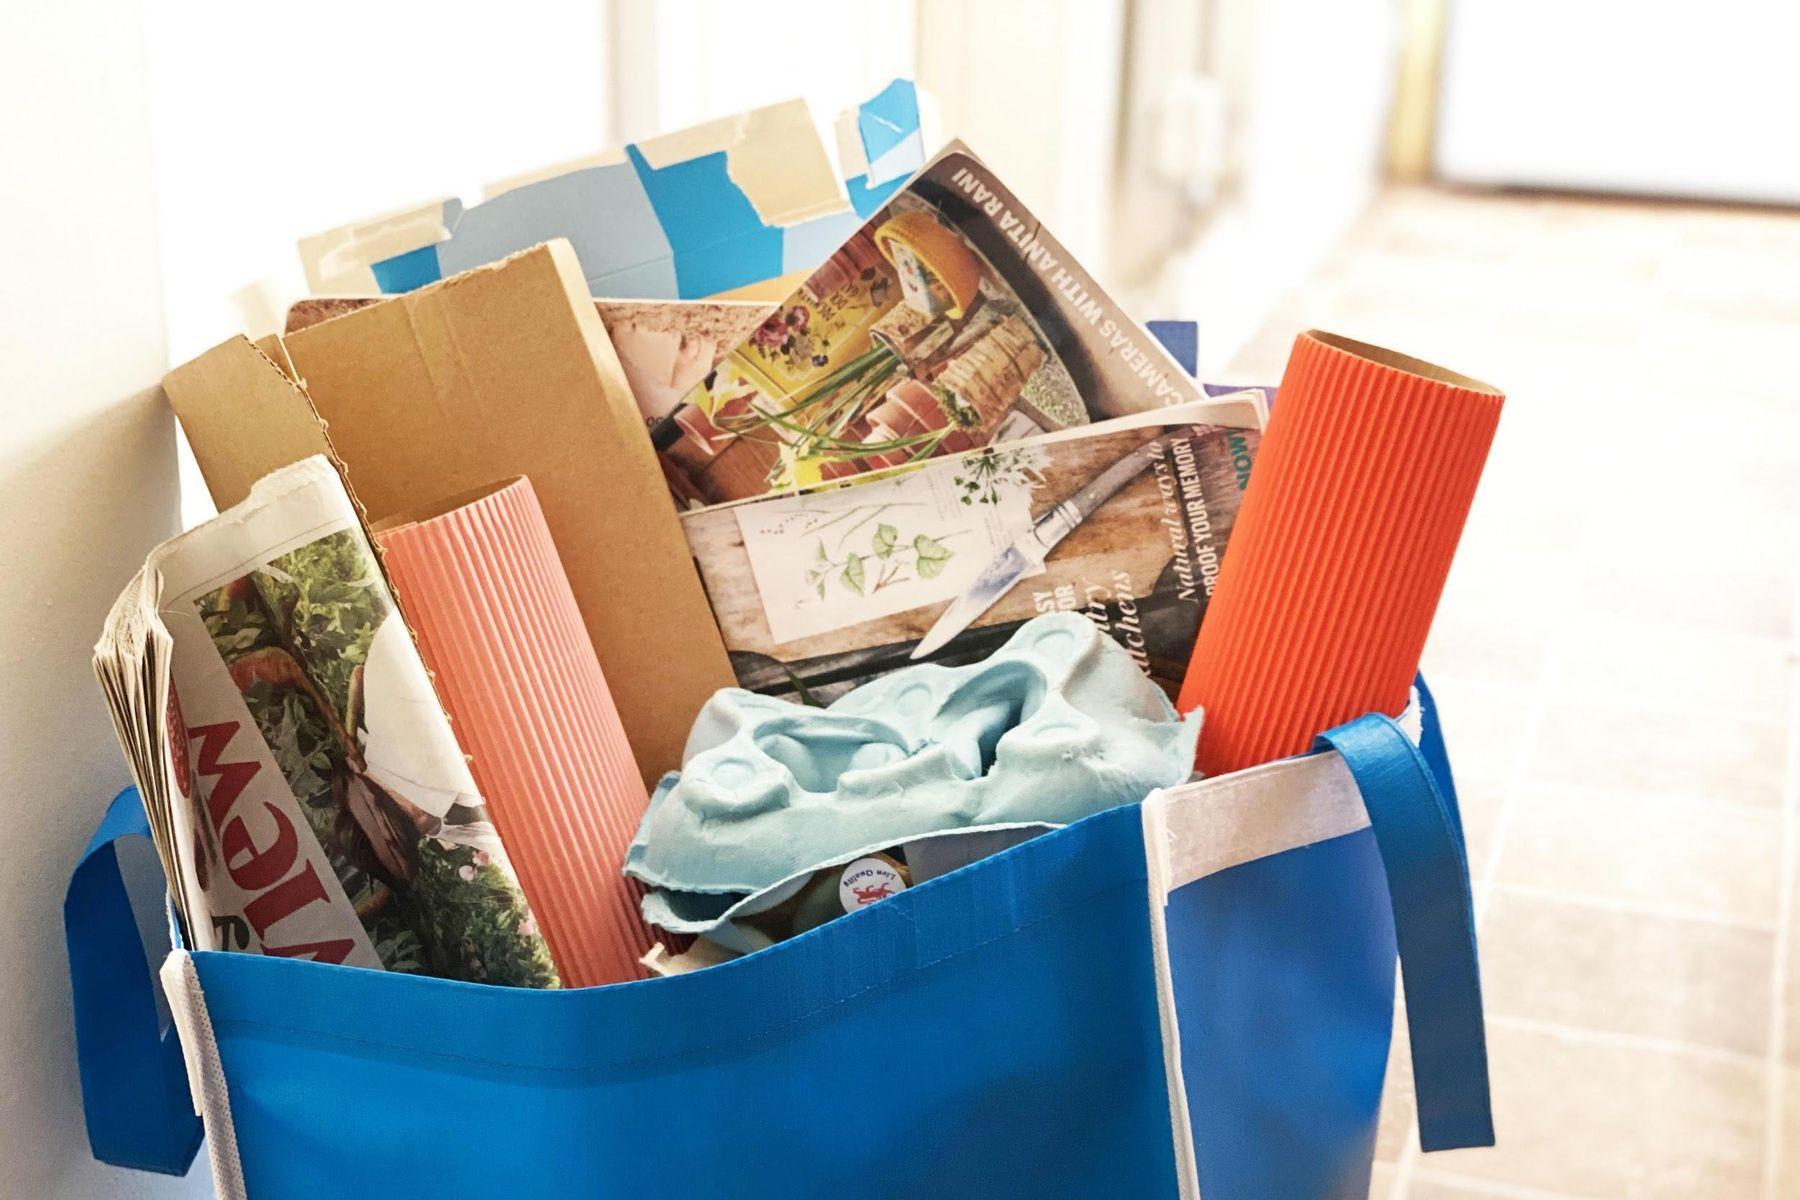 saco contendo papel para ser reciclado